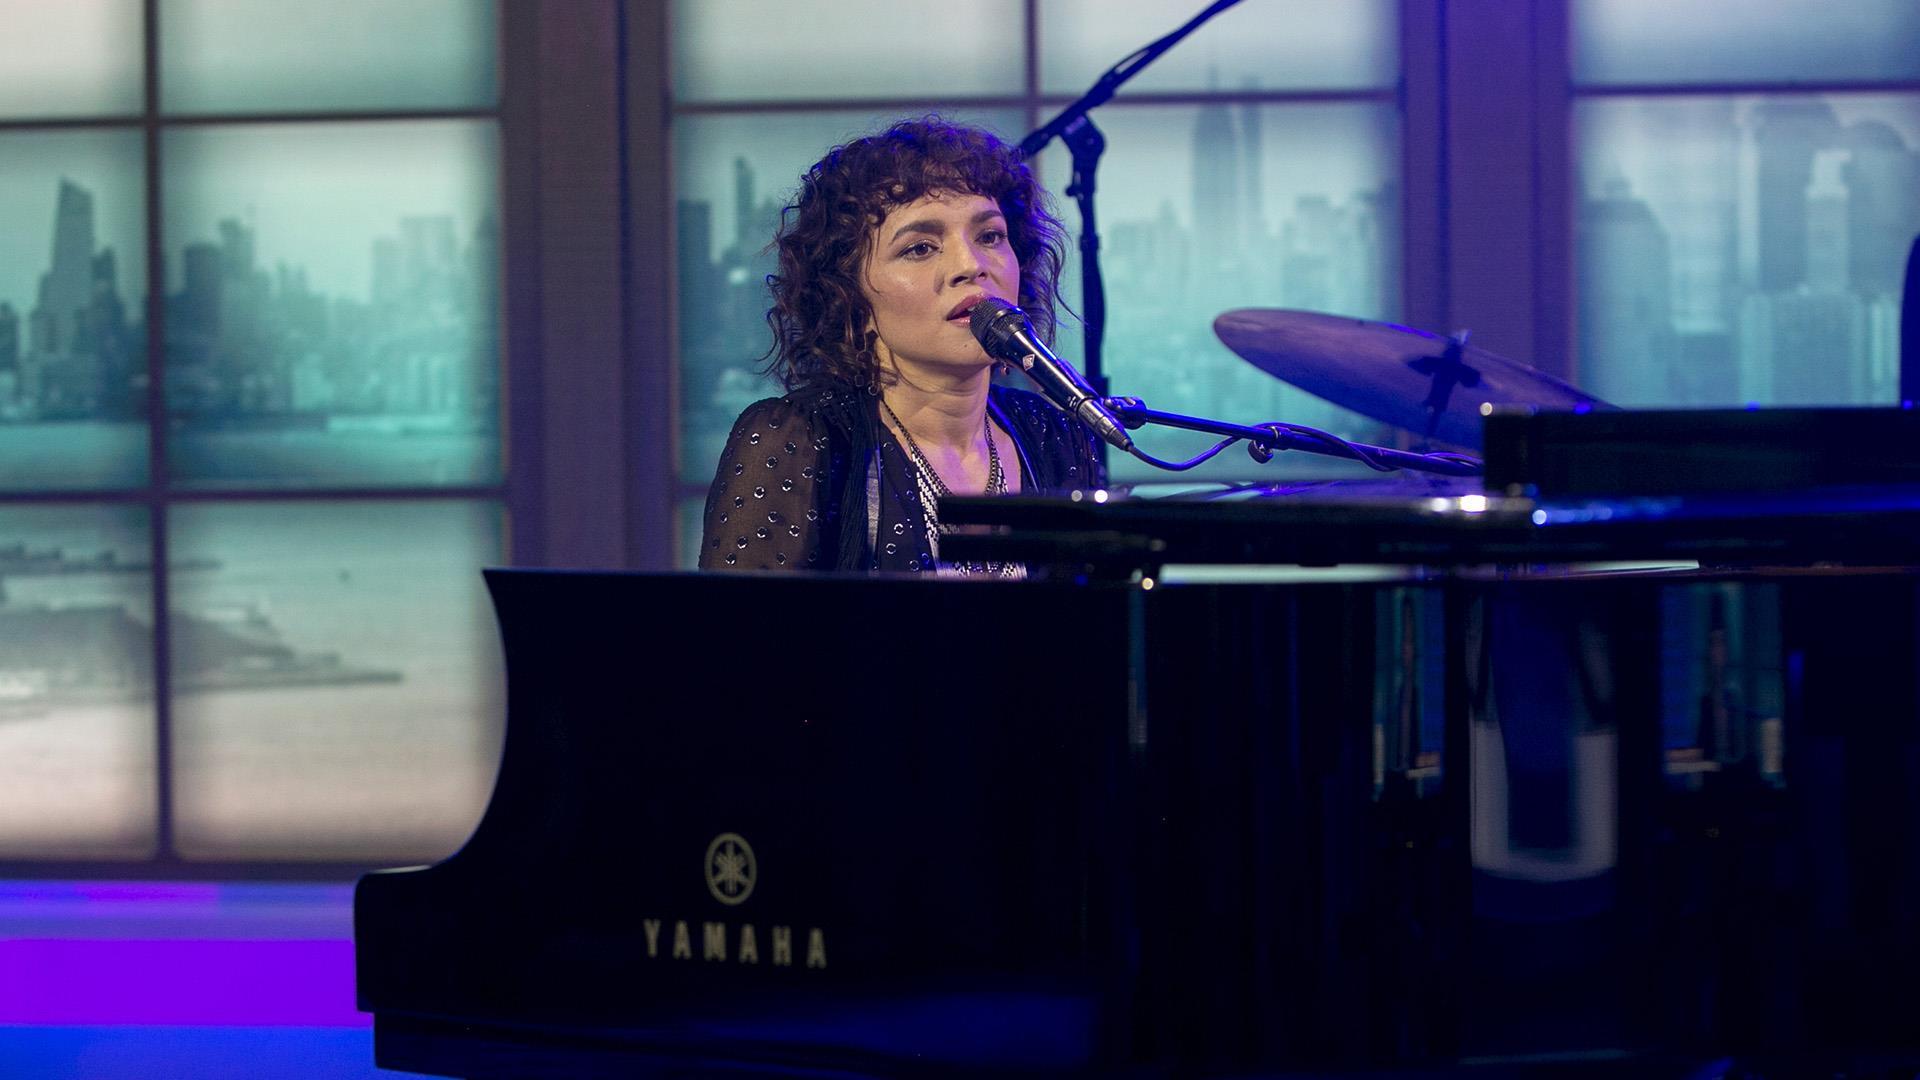 Watch Norah Jones sing 'Begin Again' live on TODAY